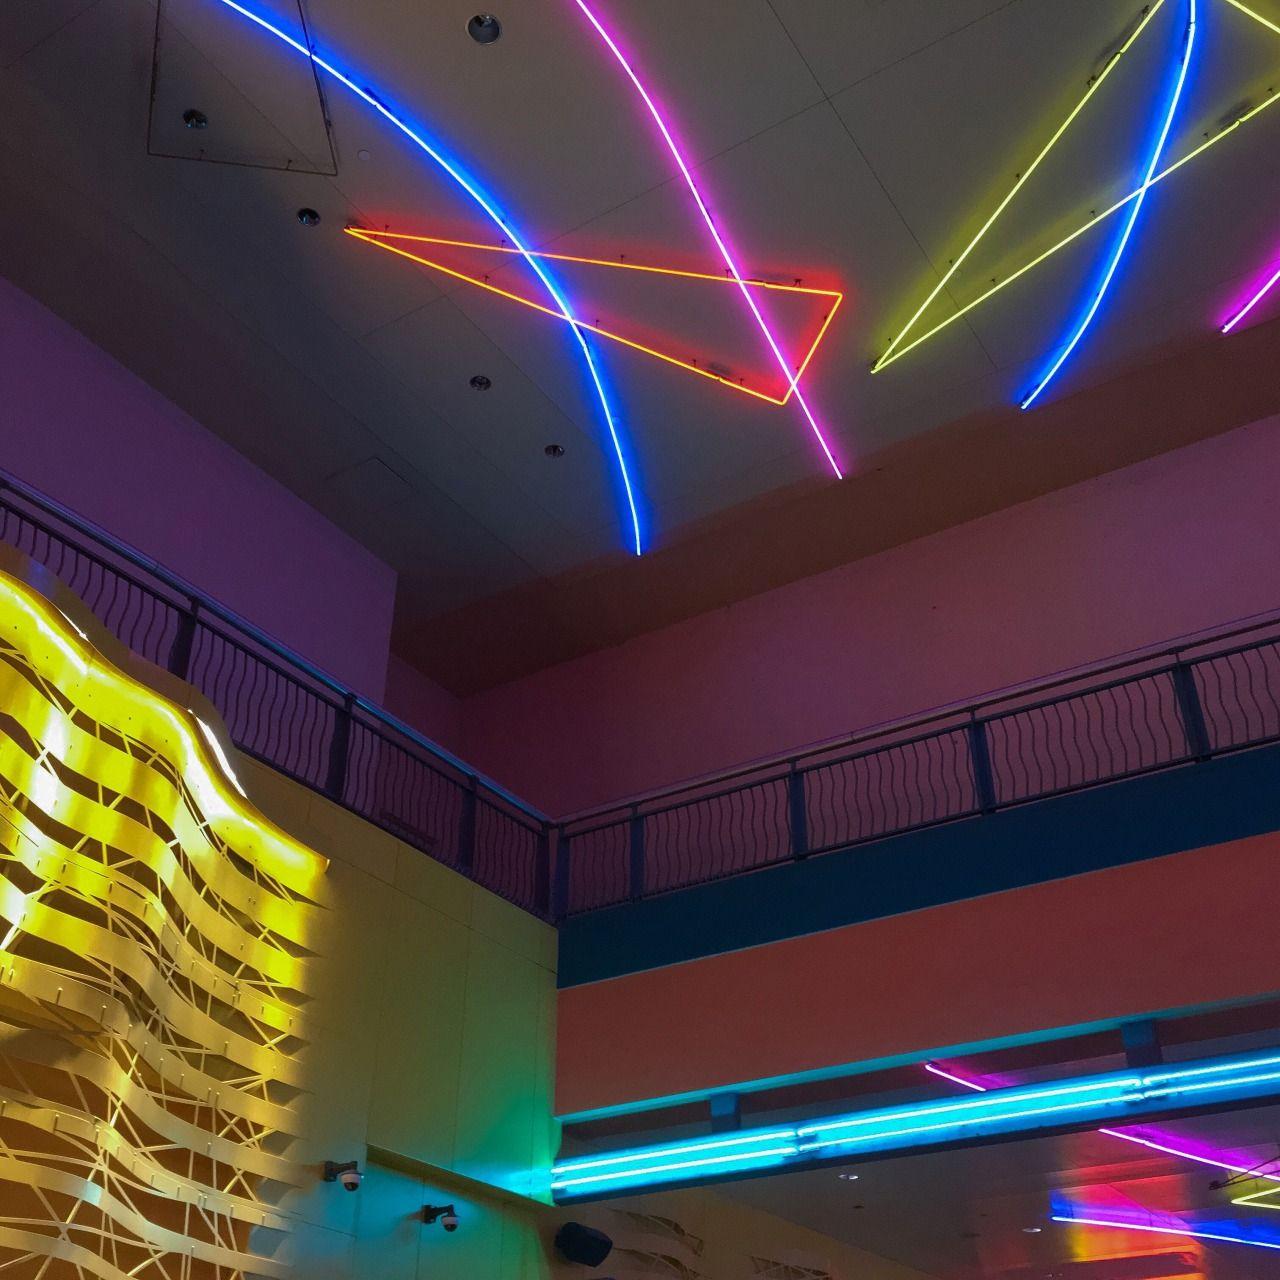 Dead Malls, Neon Aesthetic, Retro